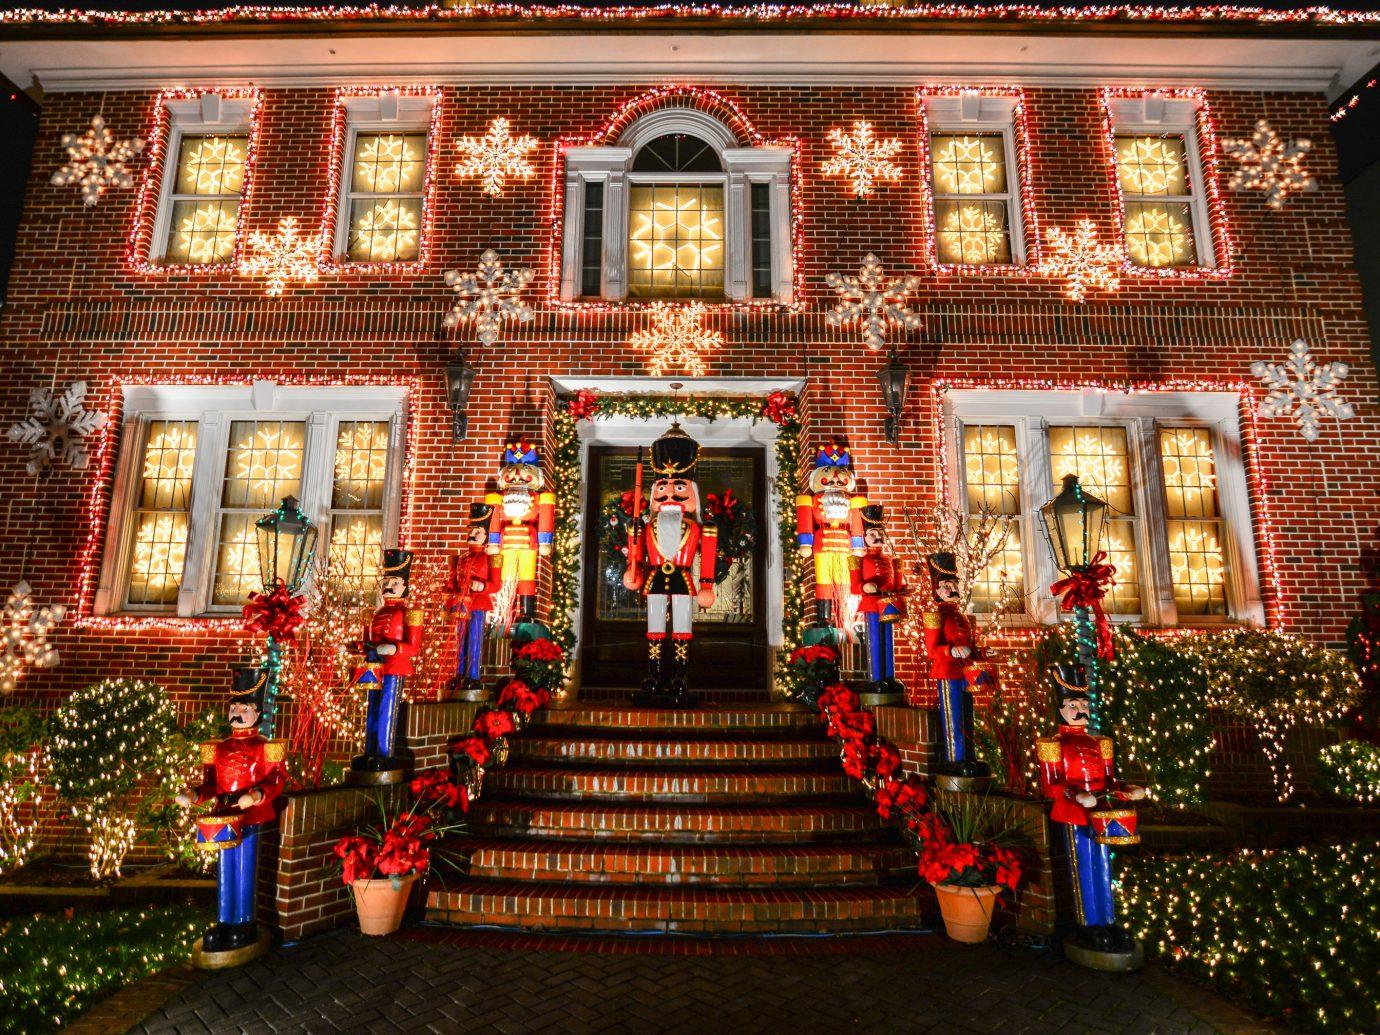 Offbeat building Christmas christmas decoration christmas lights holiday shrine temple decorated altar